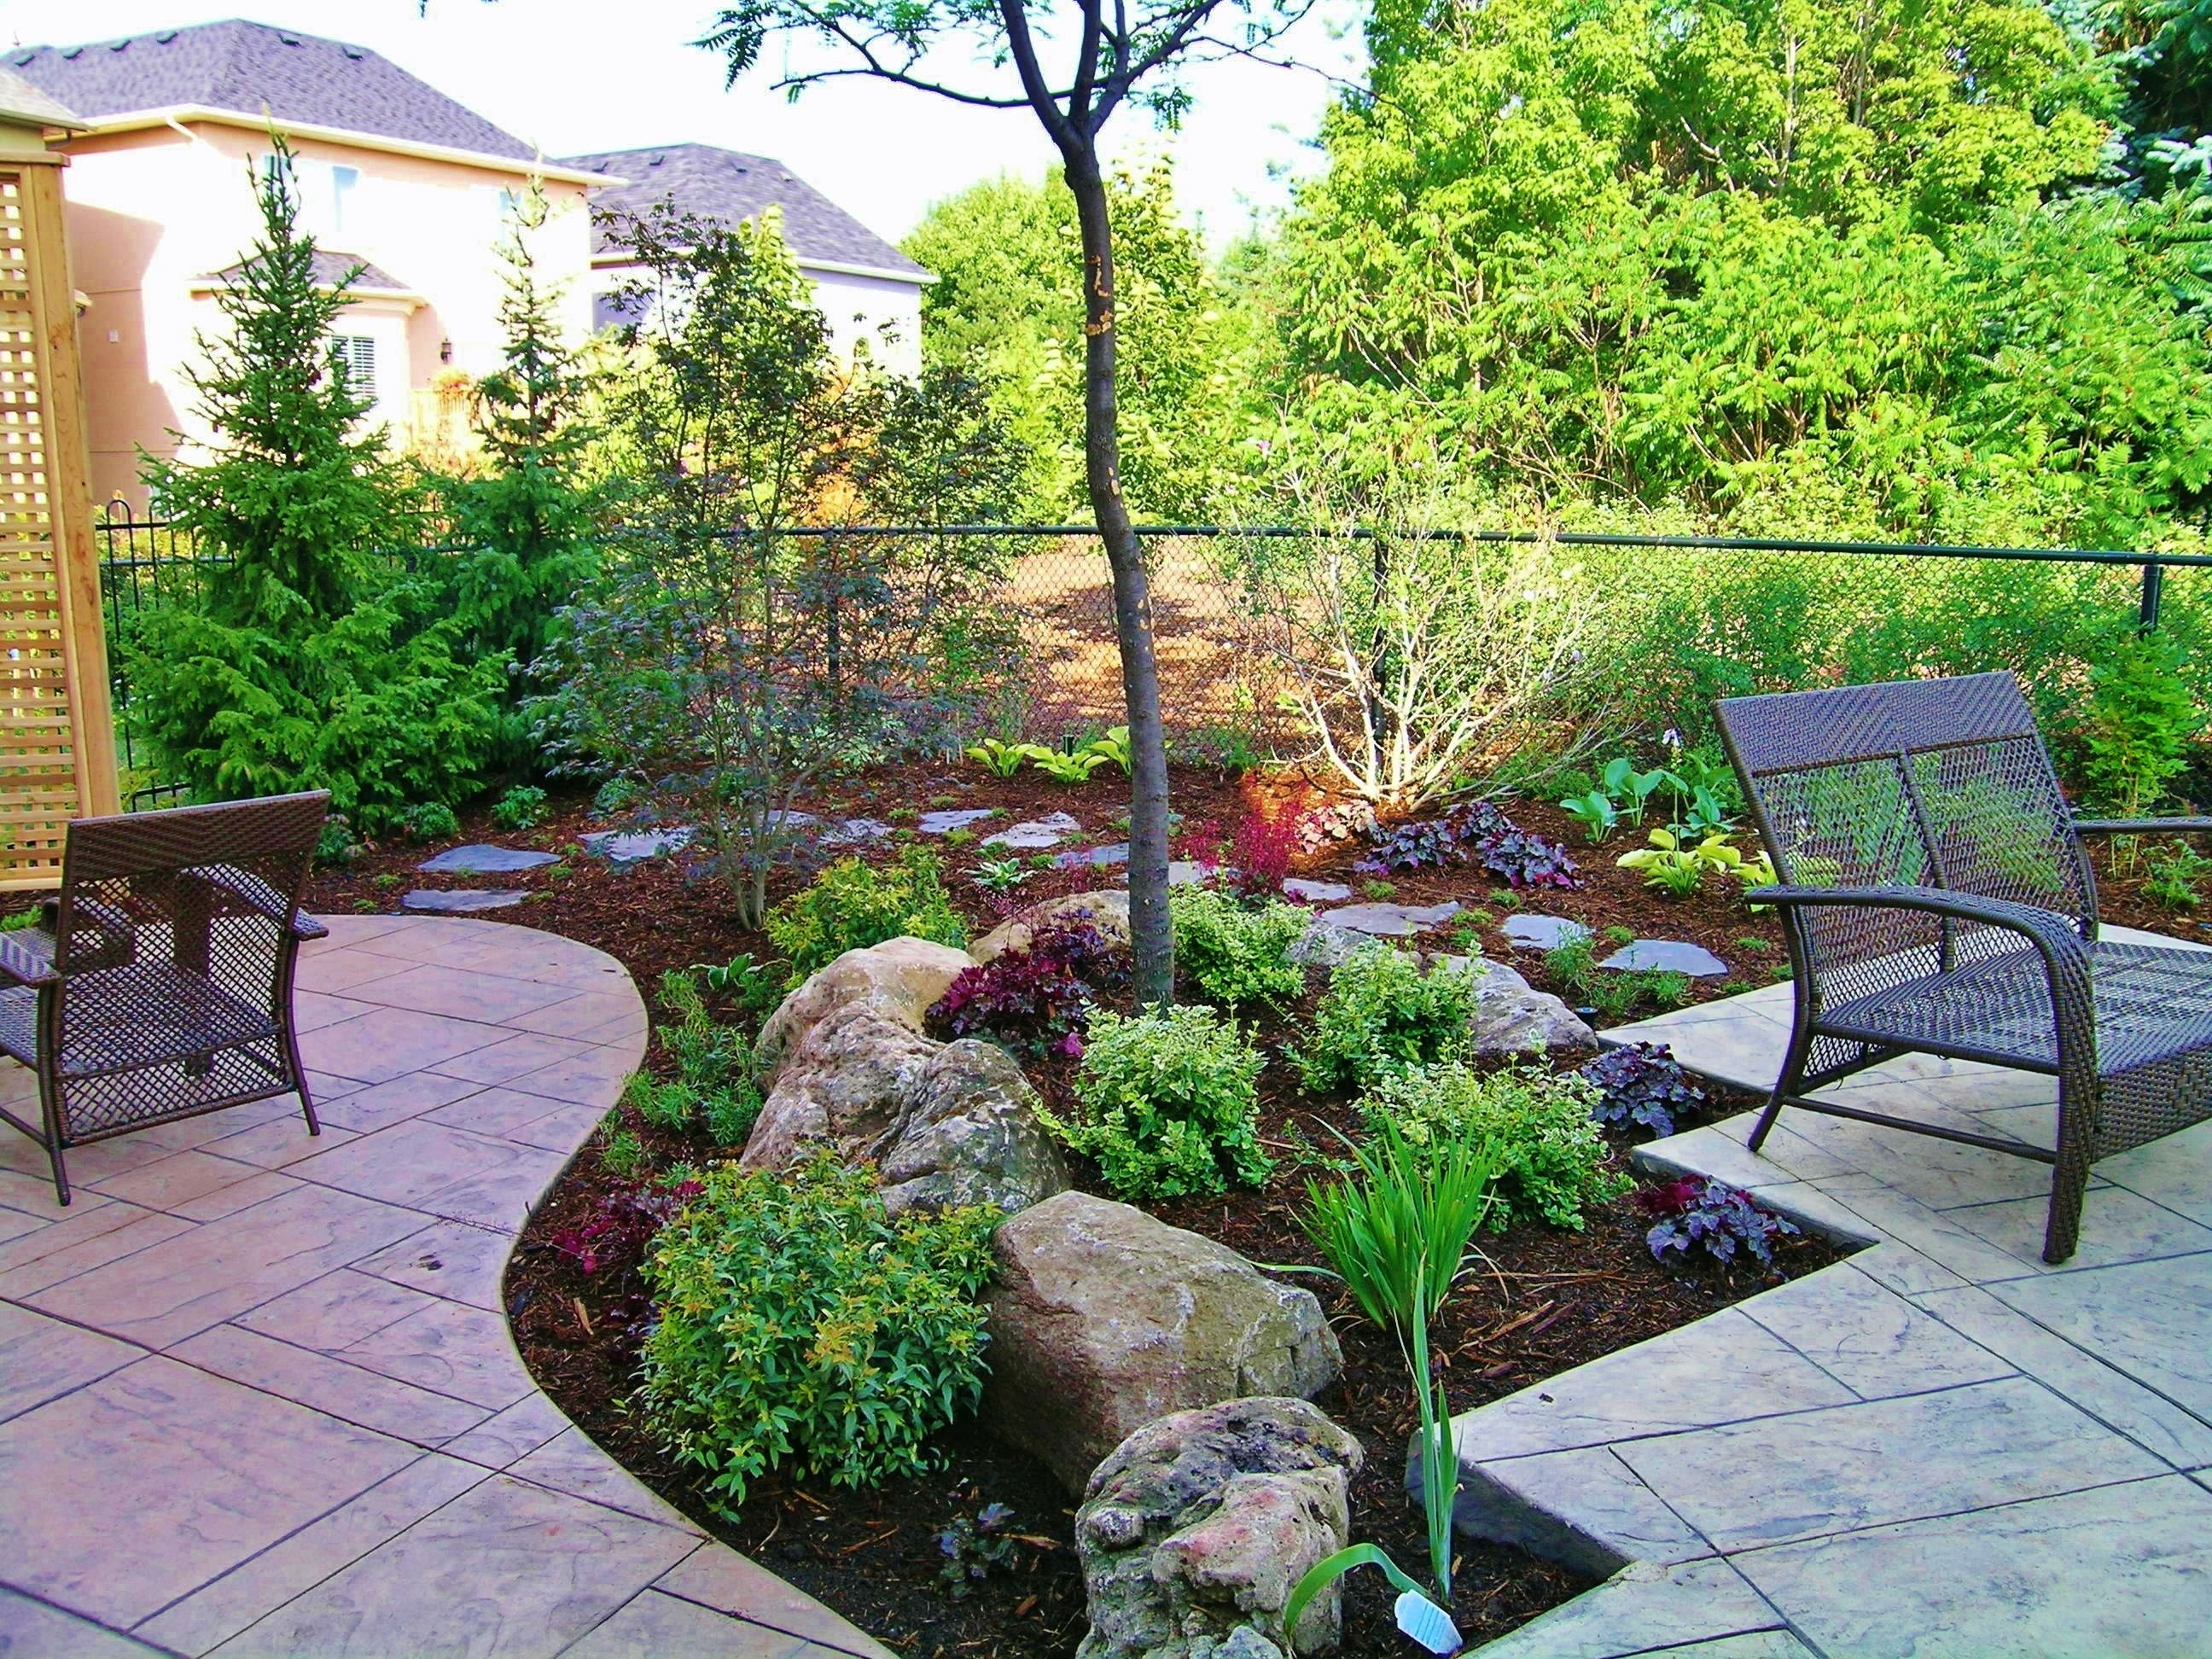 garden design ideas without grass photo - 10